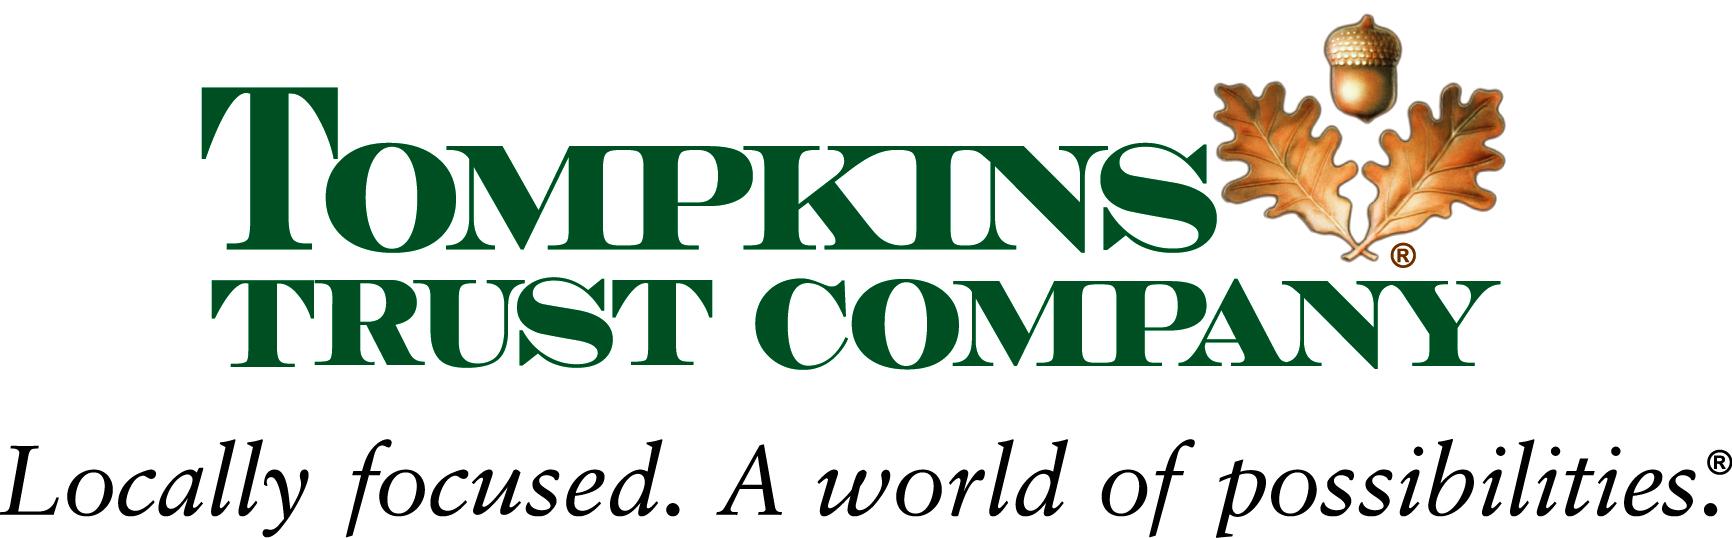 Tompkins Trust Company